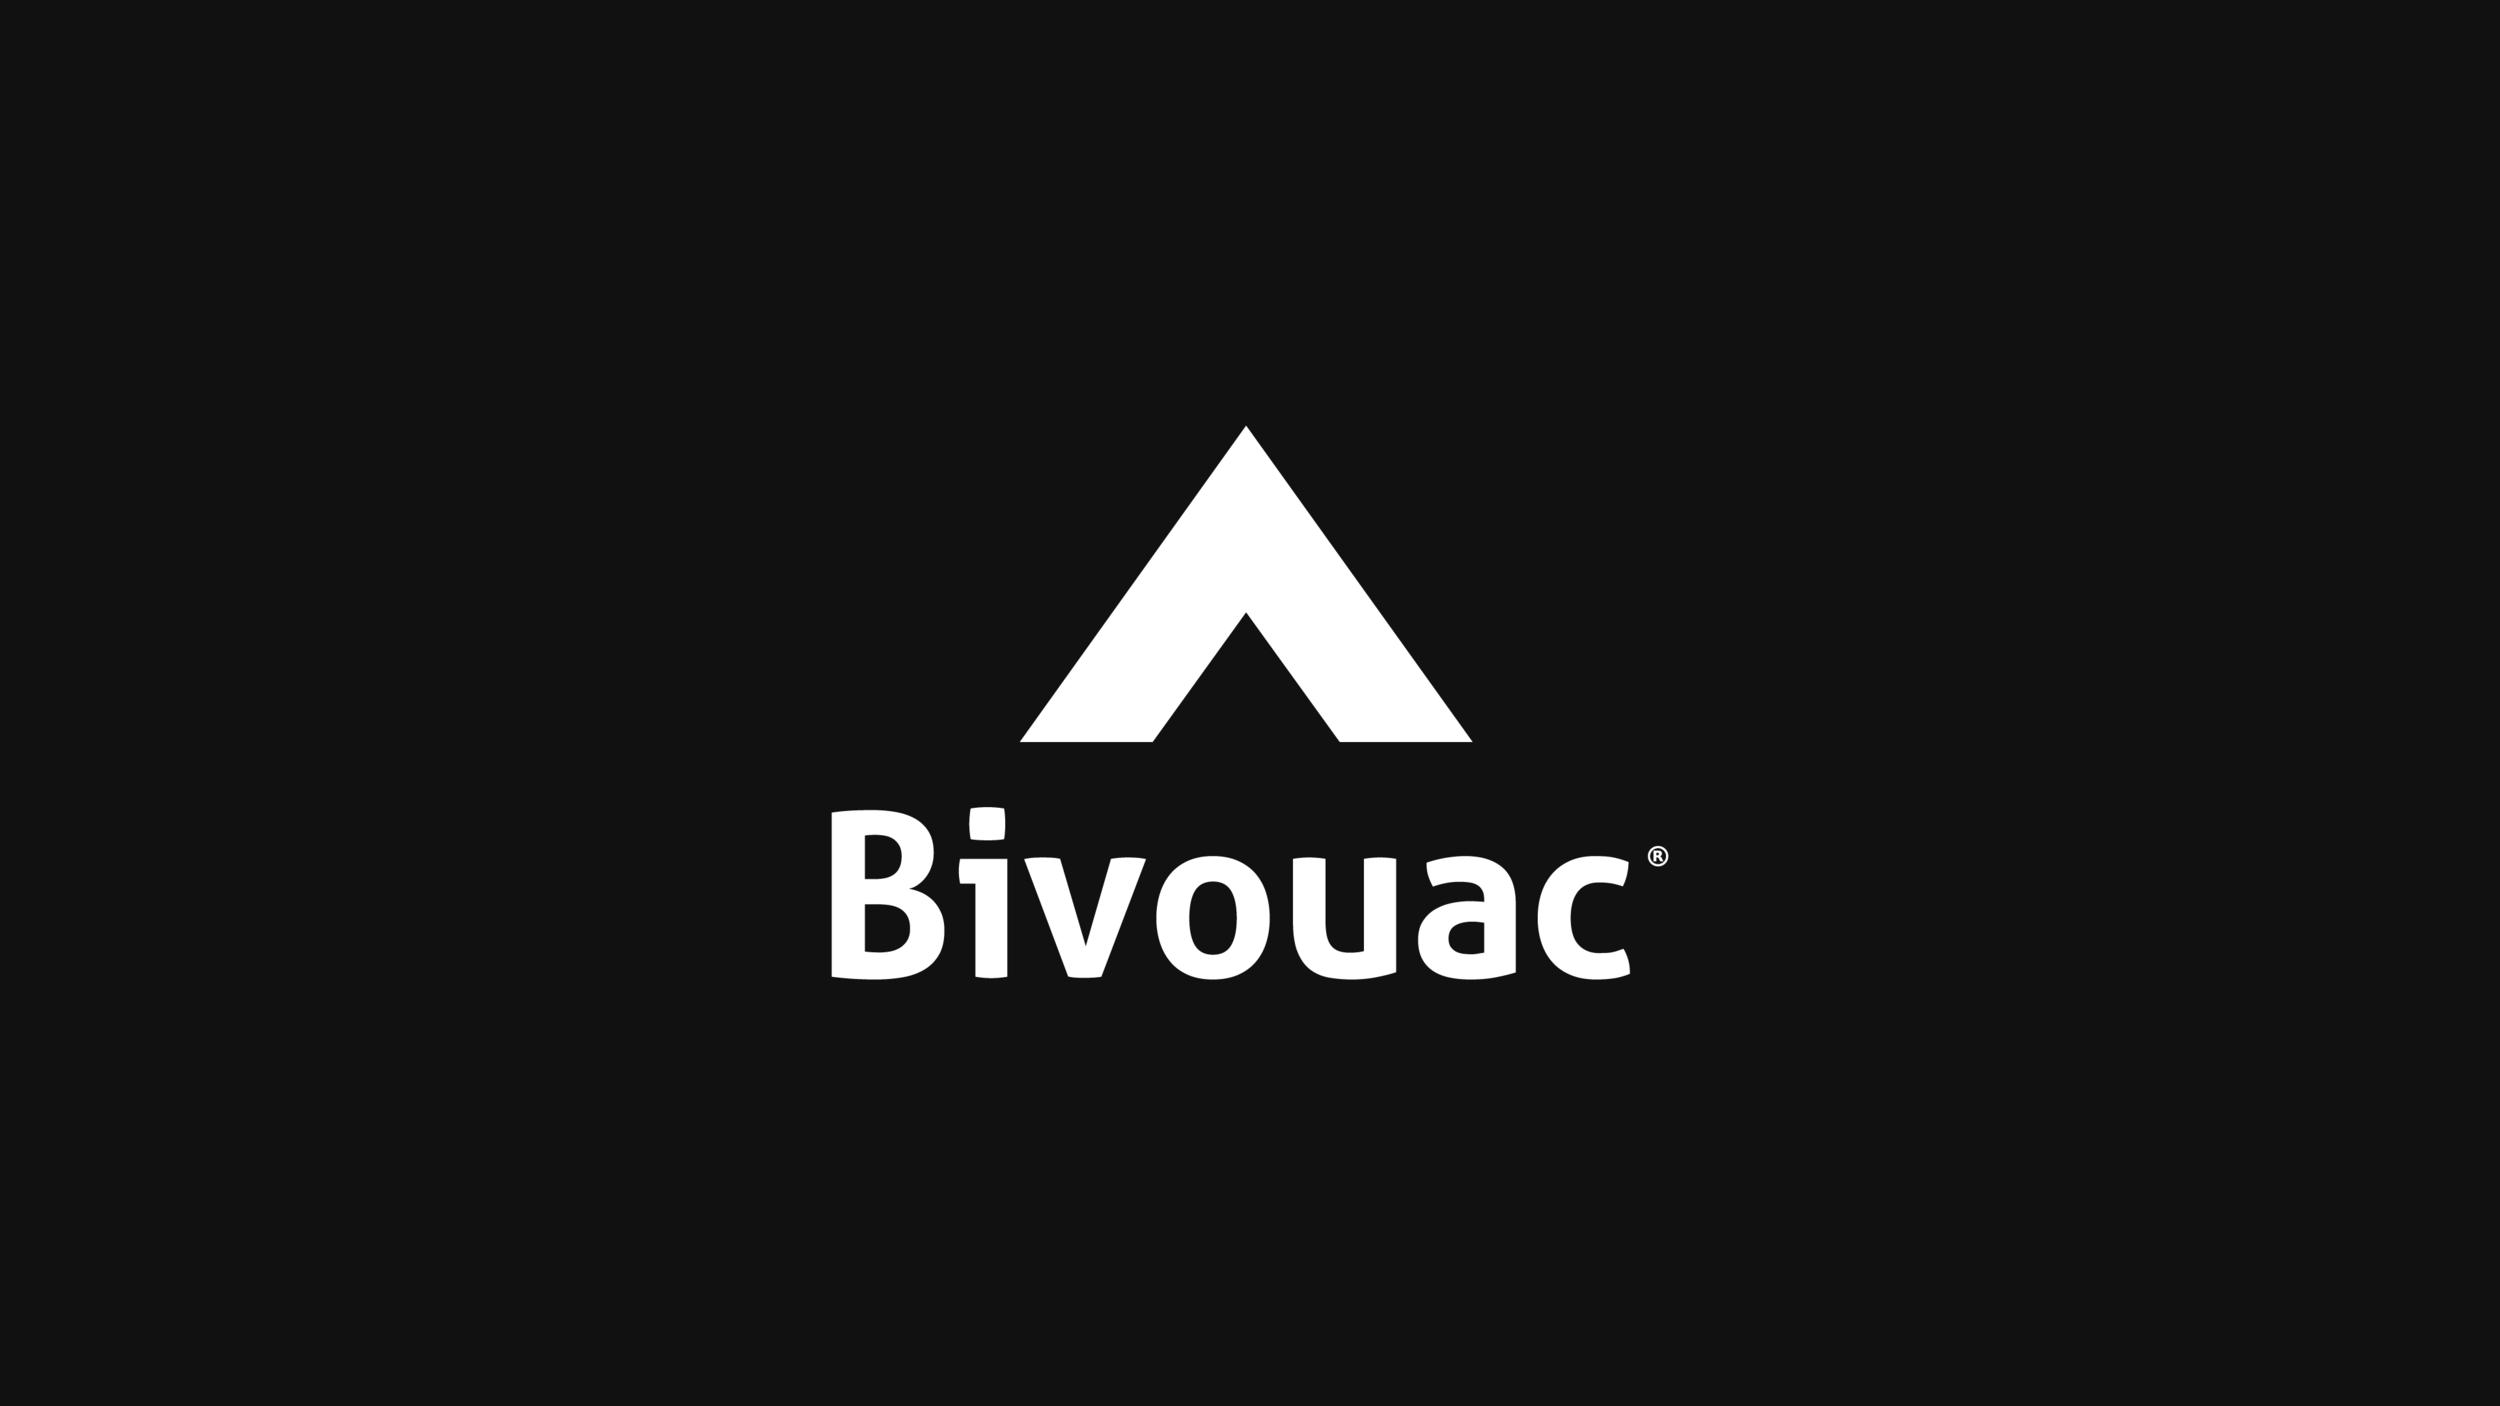 Bivoauc Coffee  - Brand Identity & Packaging Design